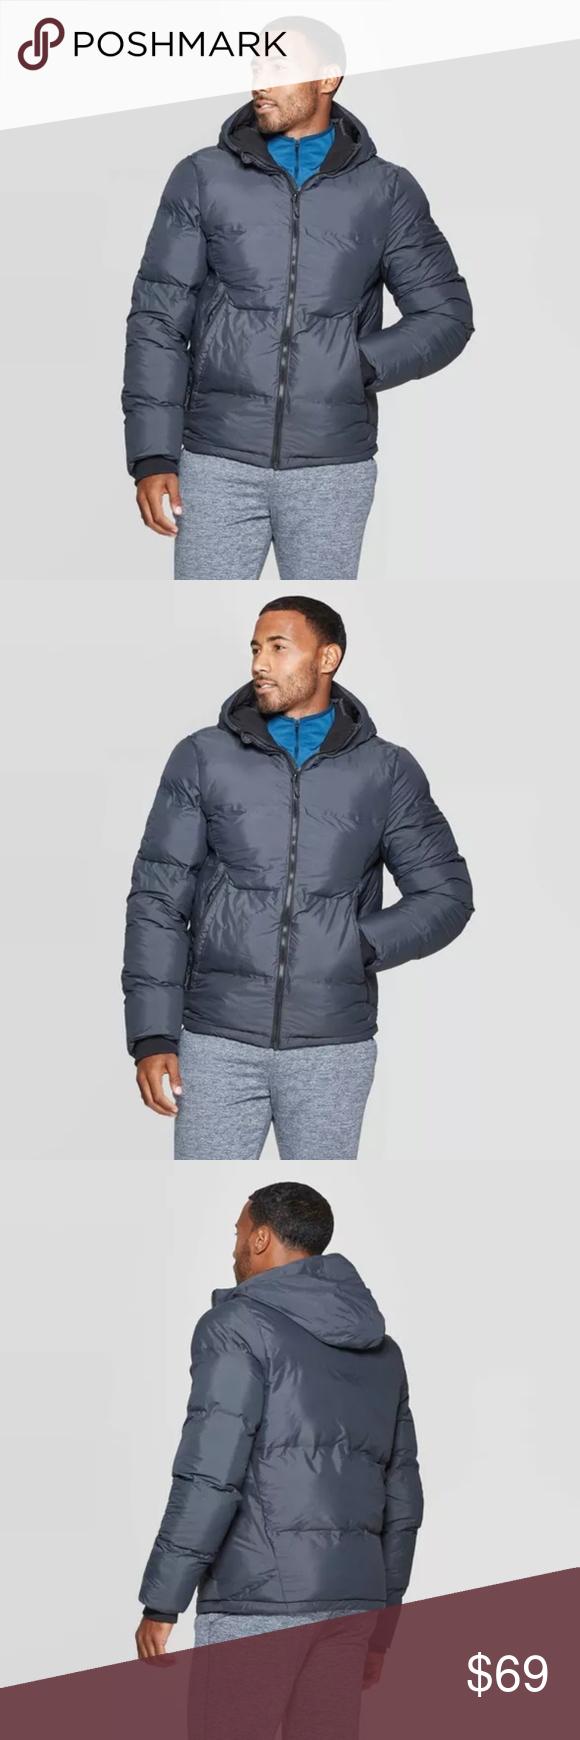 Champion Men S Puffer Jacket Gray S Mens Puffer Jacket Fashion Deals Gray Jacket [ 1740 x 580 Pixel ]